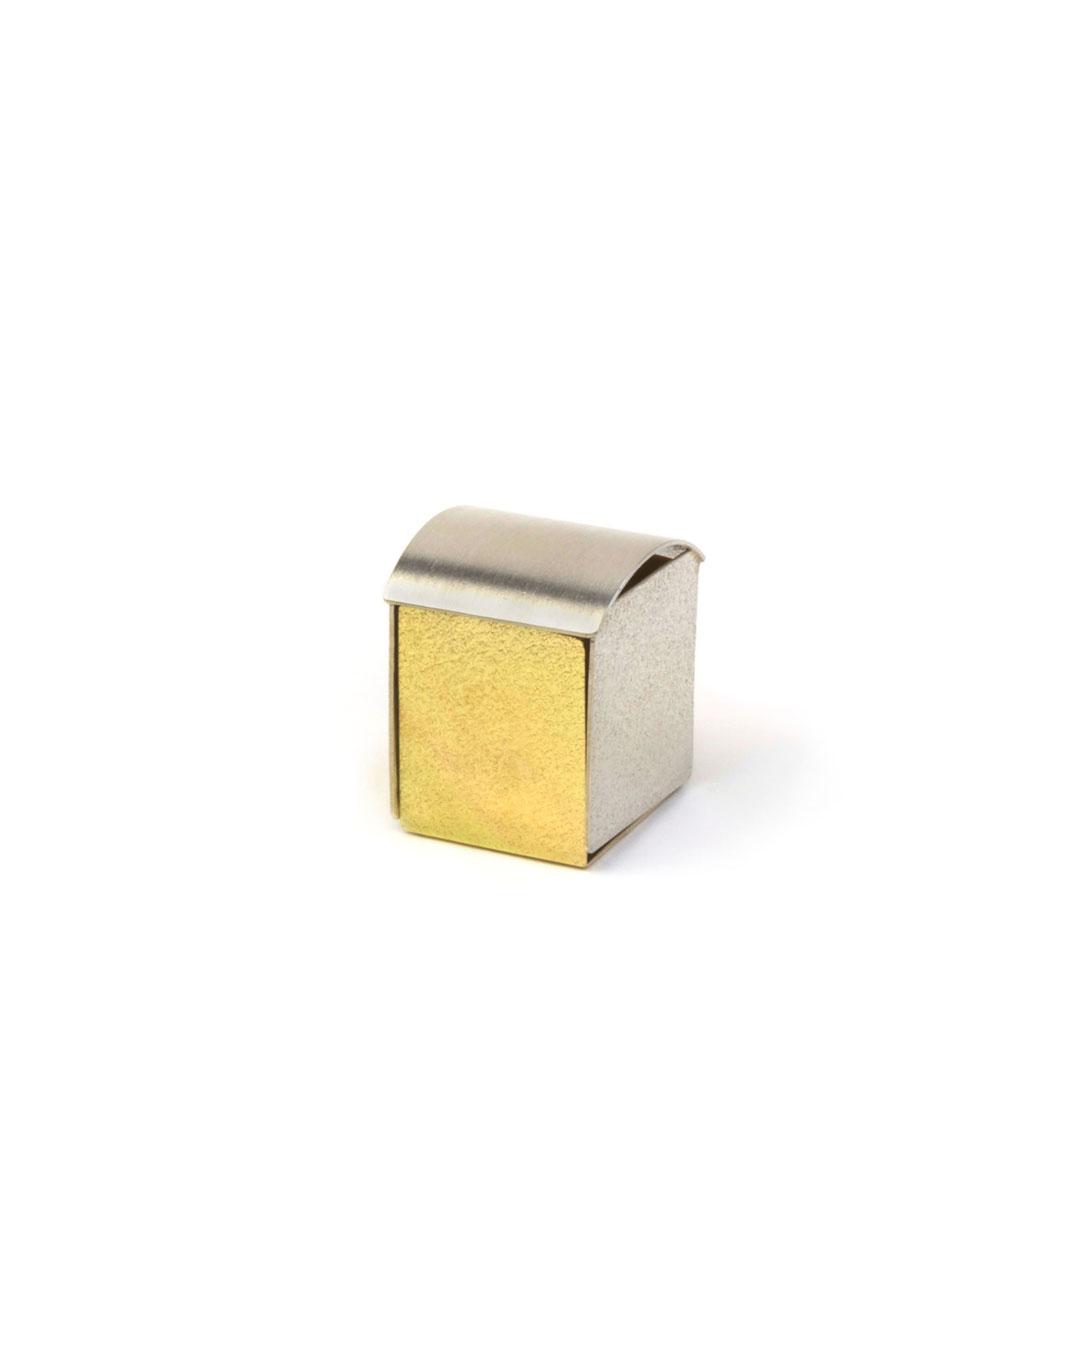 Okinari Kurokawa, untitled, 2008, ring; 970 silver, 835 gold, 23 x 20 x 18 mm, €1700